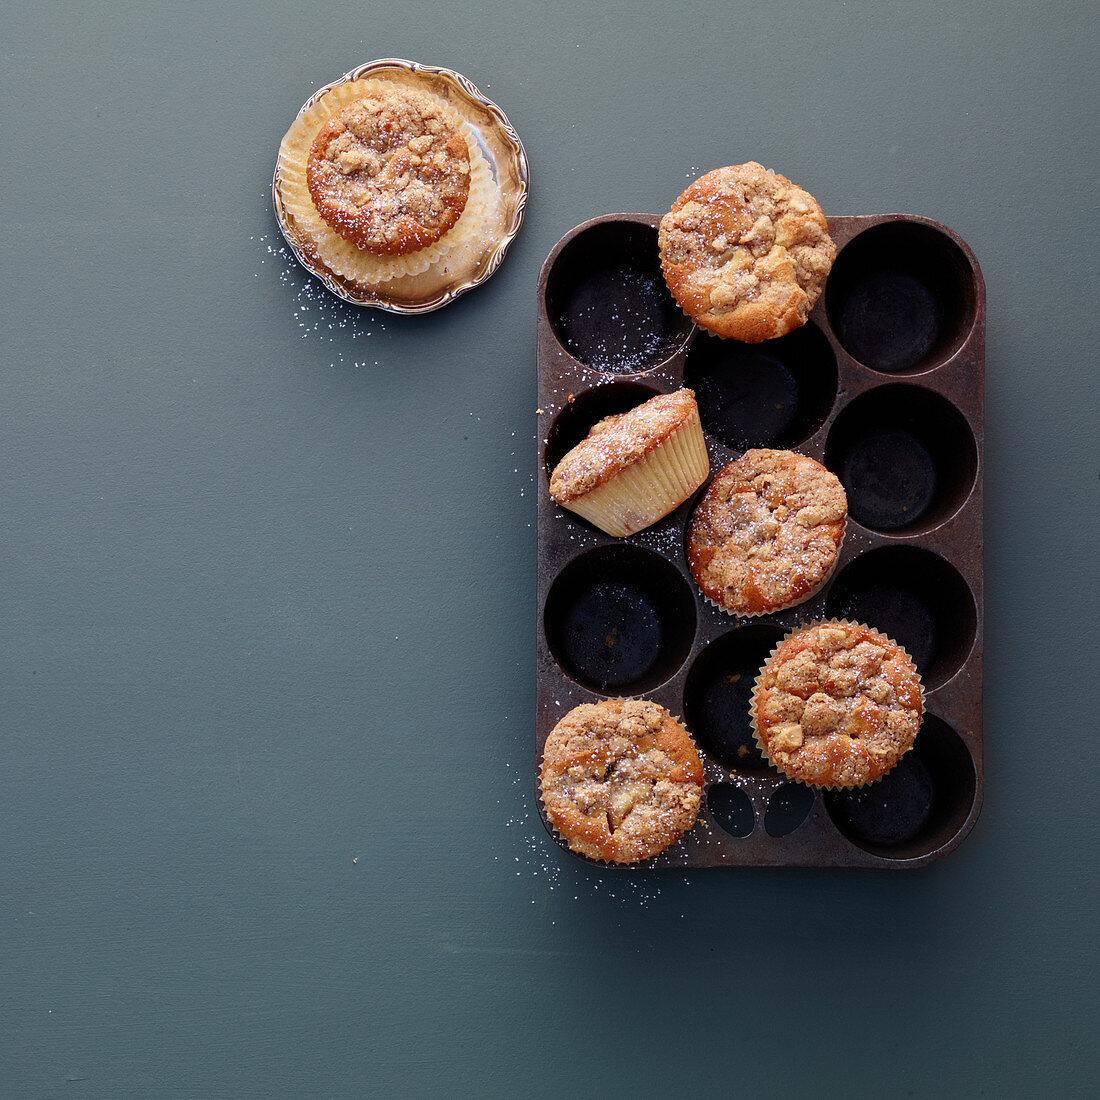 Pear muffins